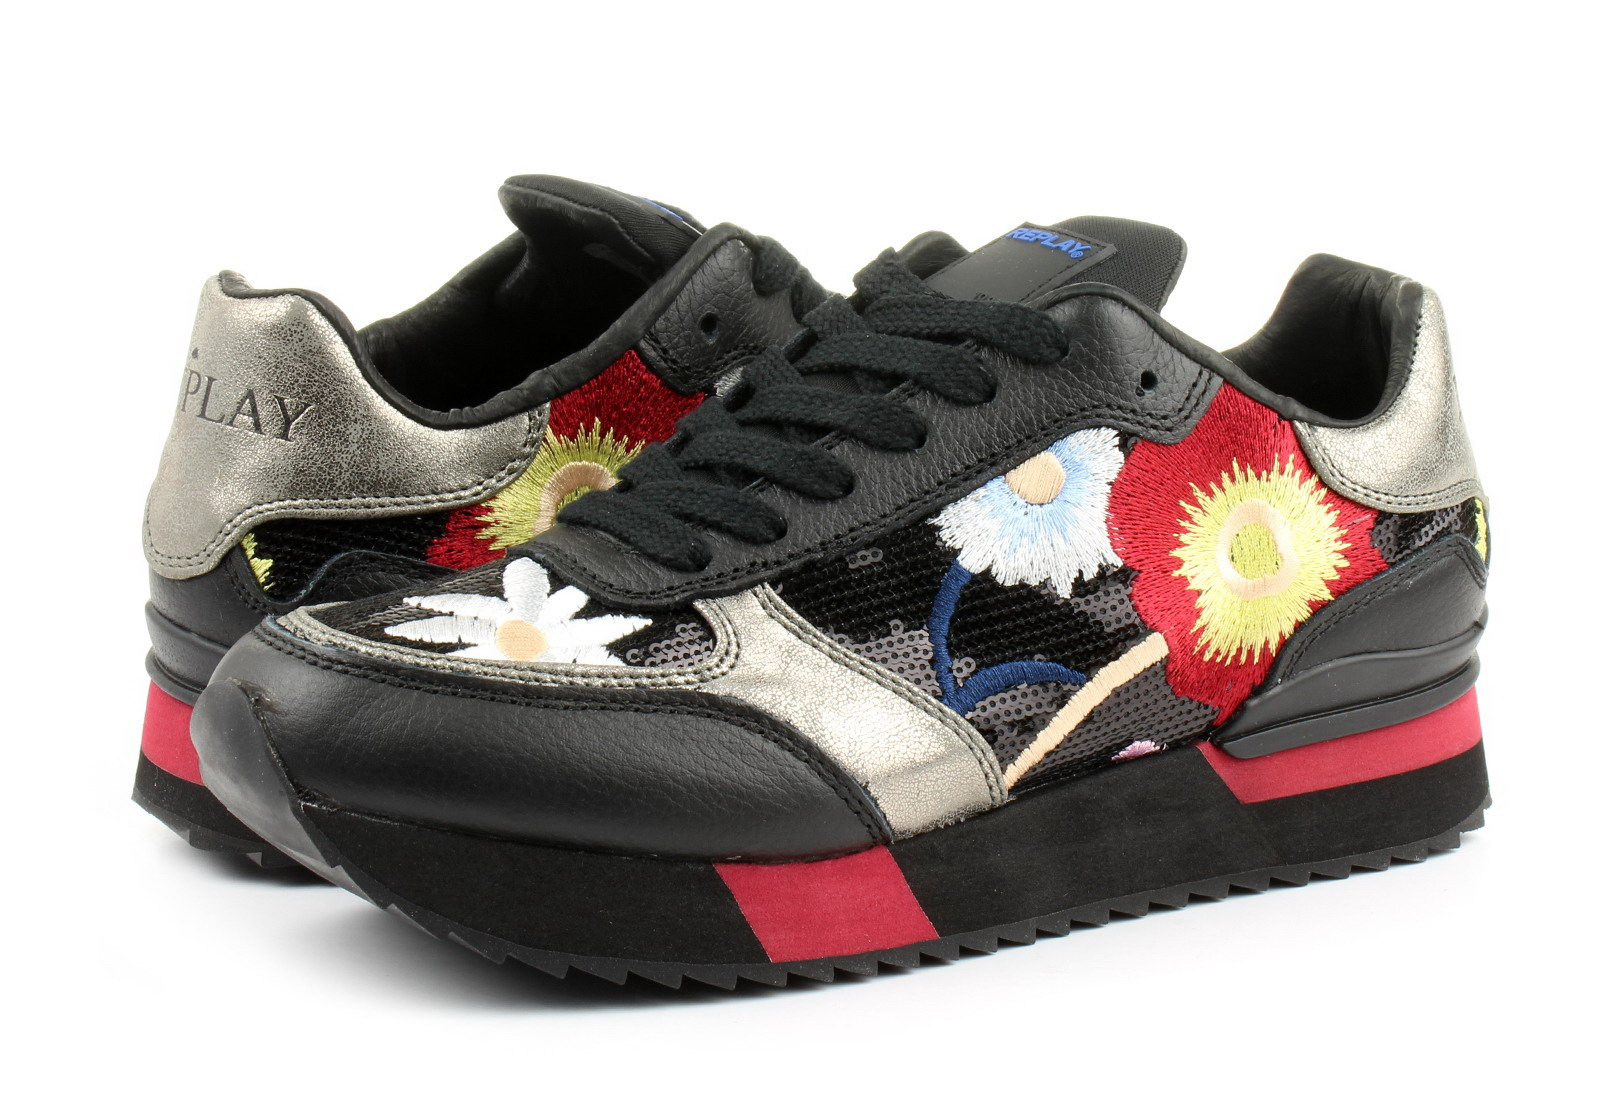 Replay Cipő - Rs630020s - RS630020S-0003 - Office Shoes Magyarország 6ec55f9815